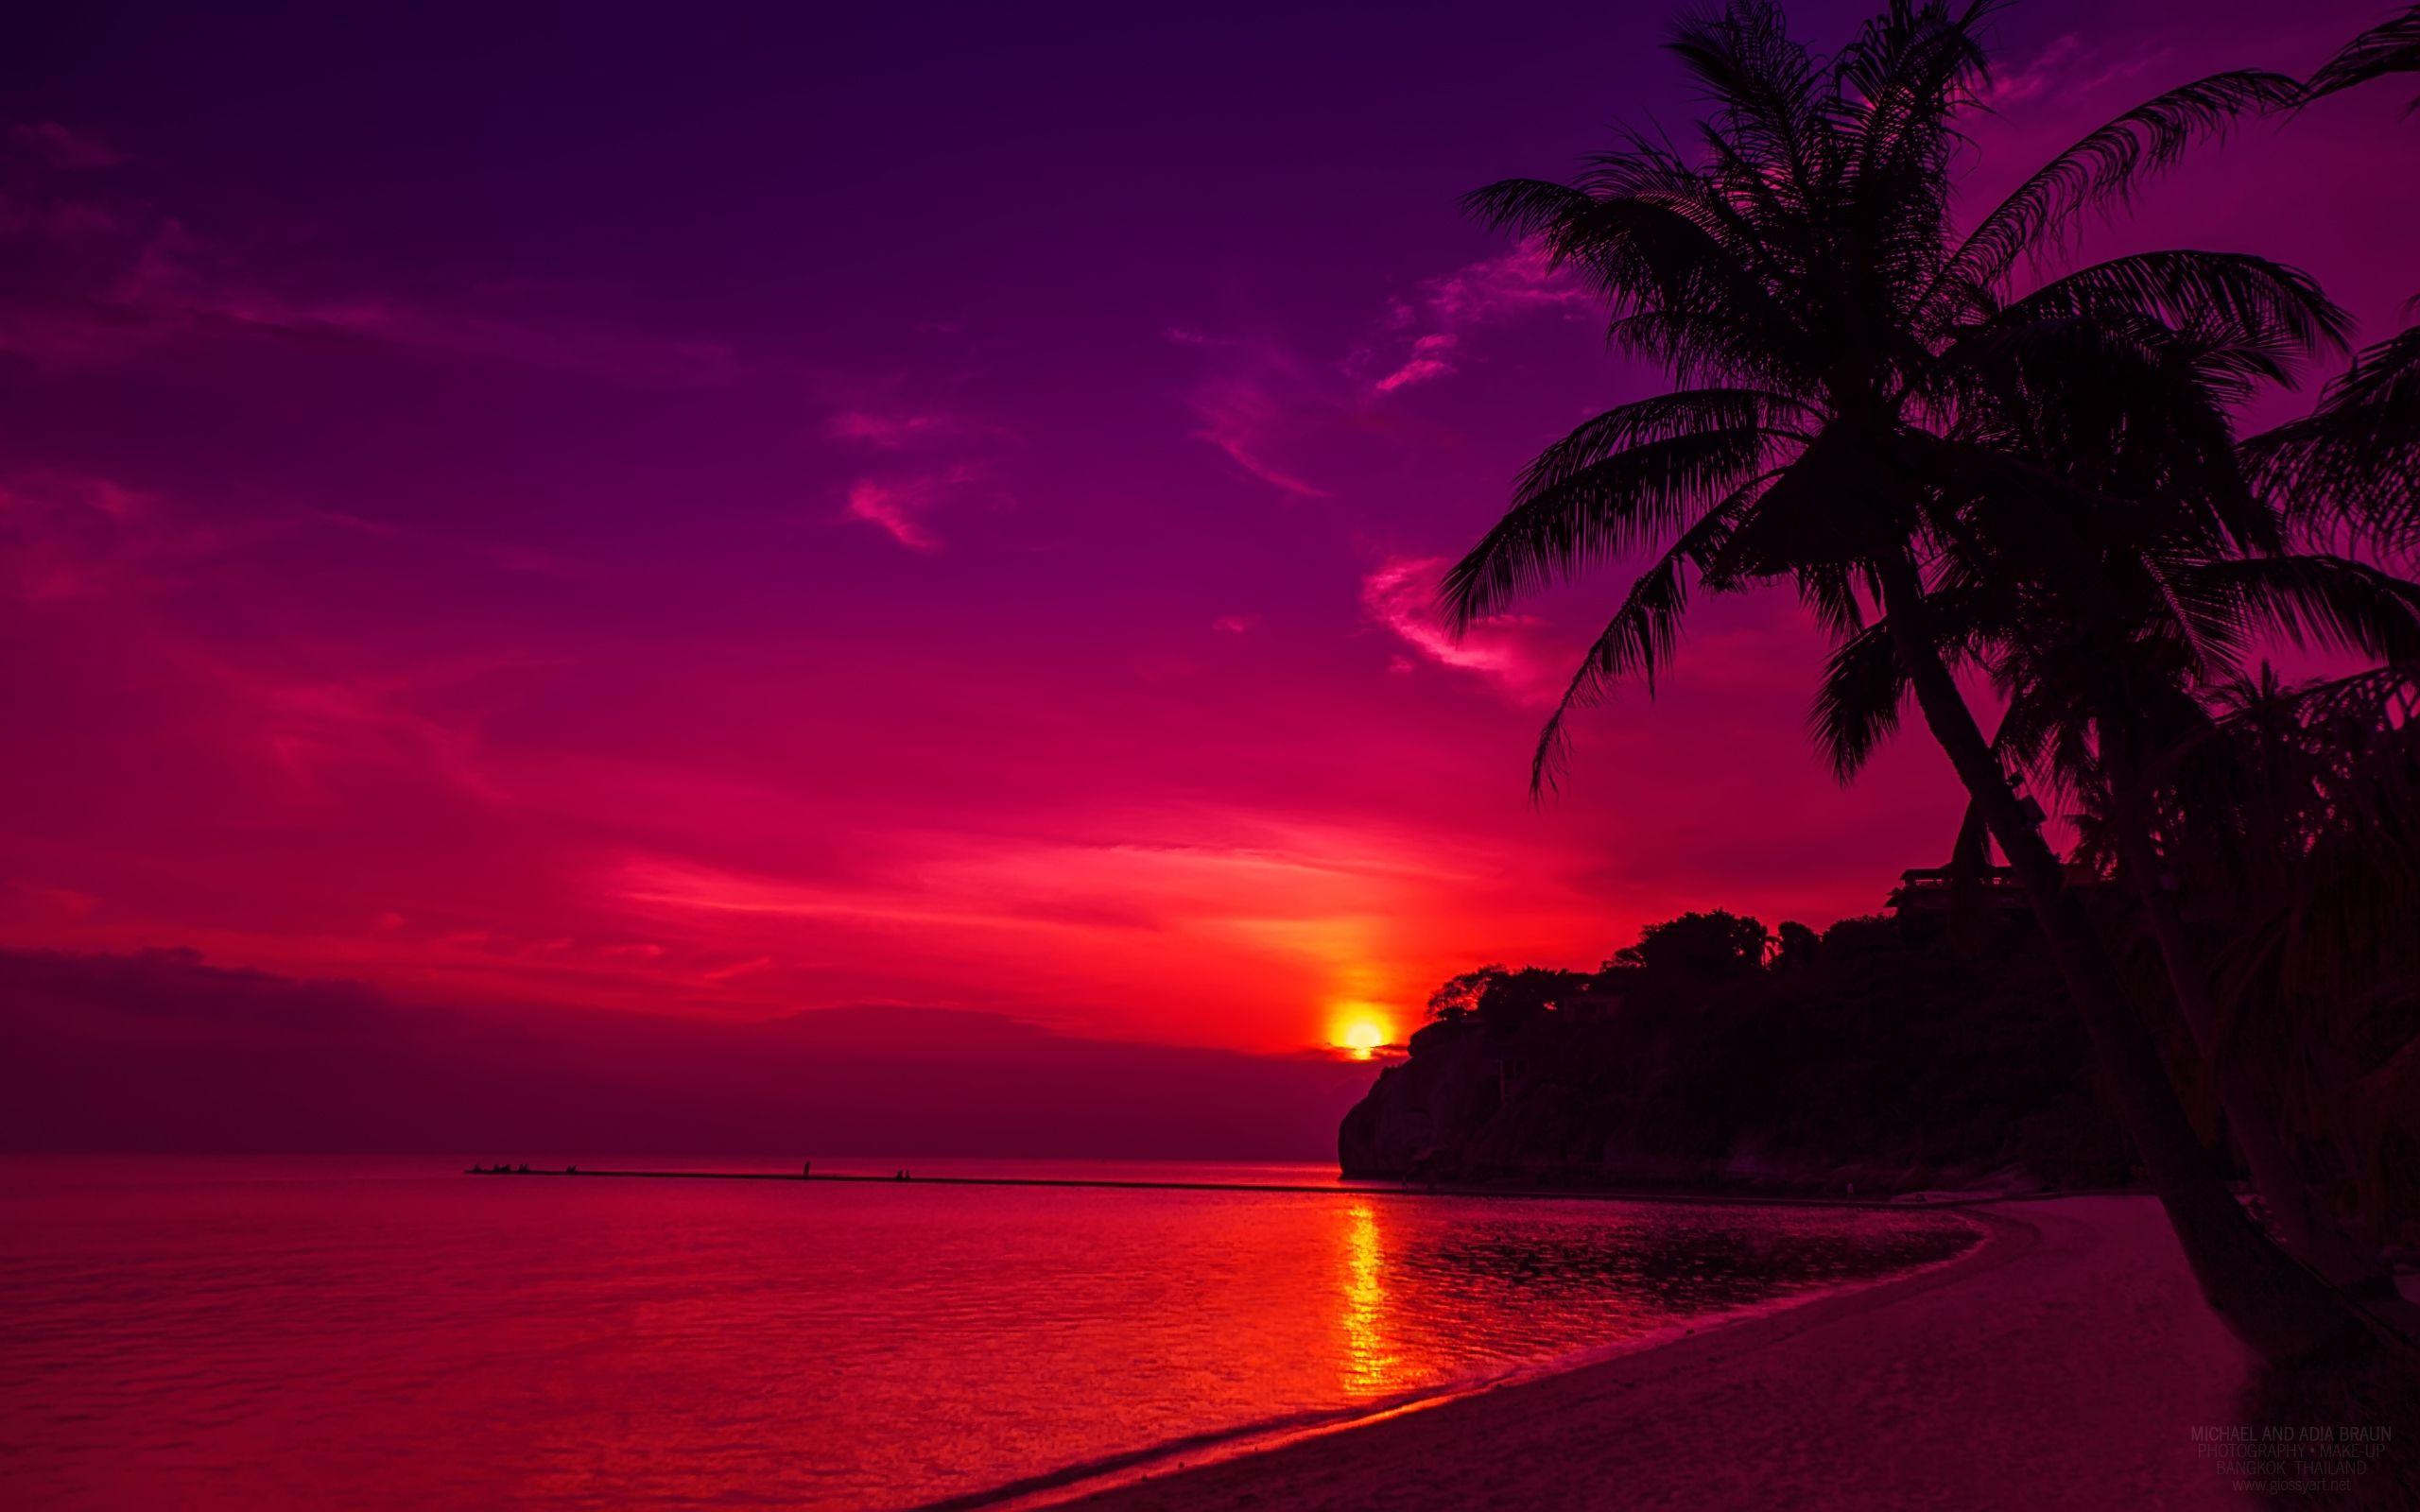 sunset - Cerca con Google